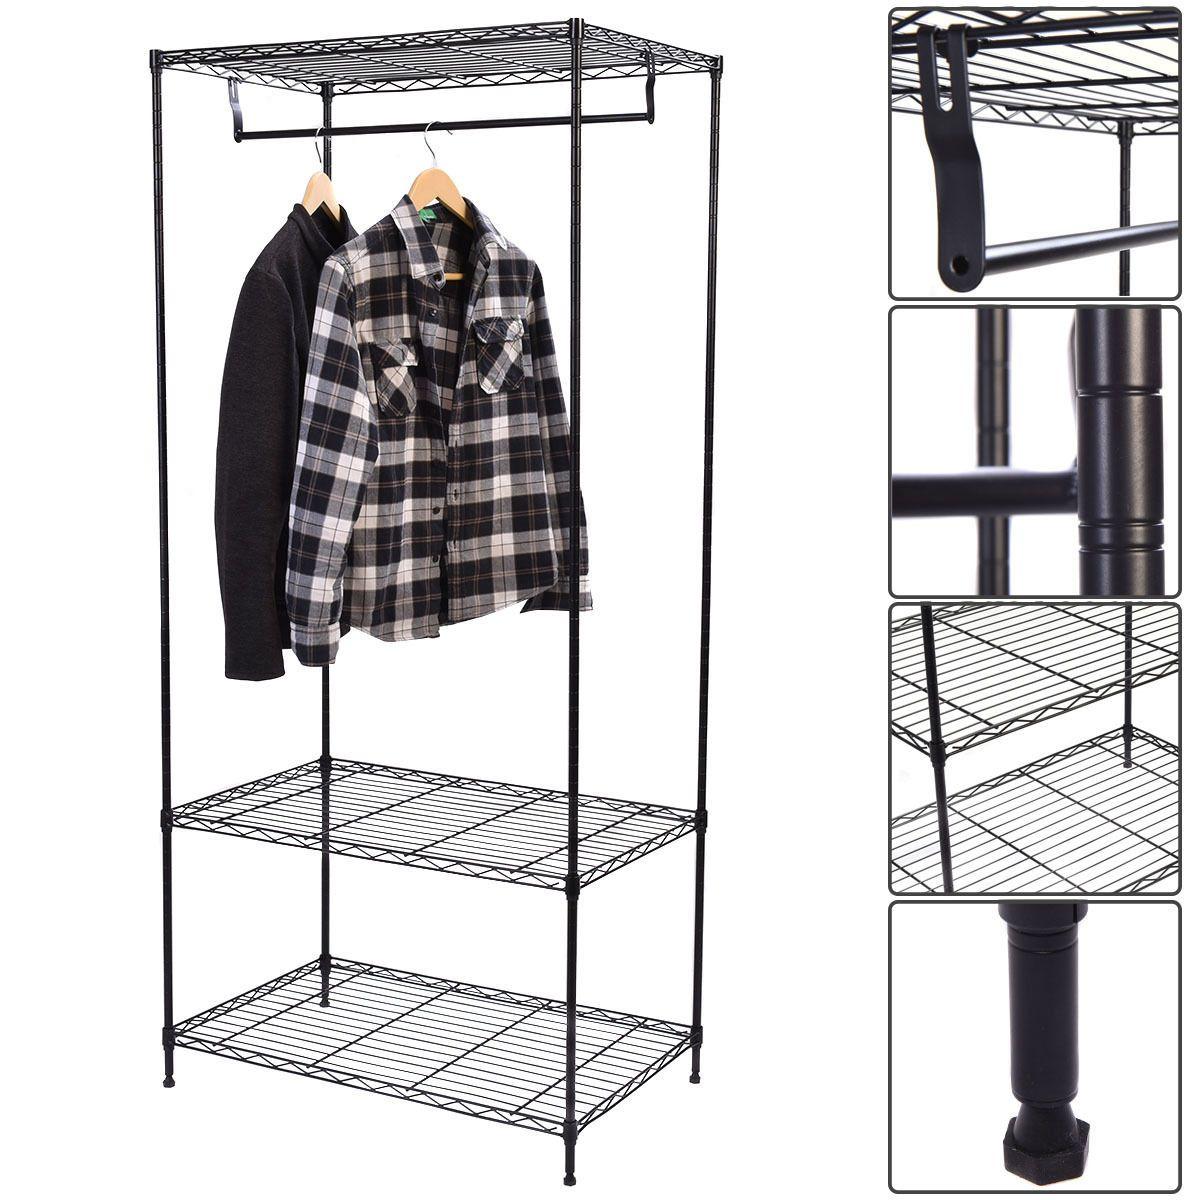 Tier clothing garment rack hanger shelving wire shelf dress